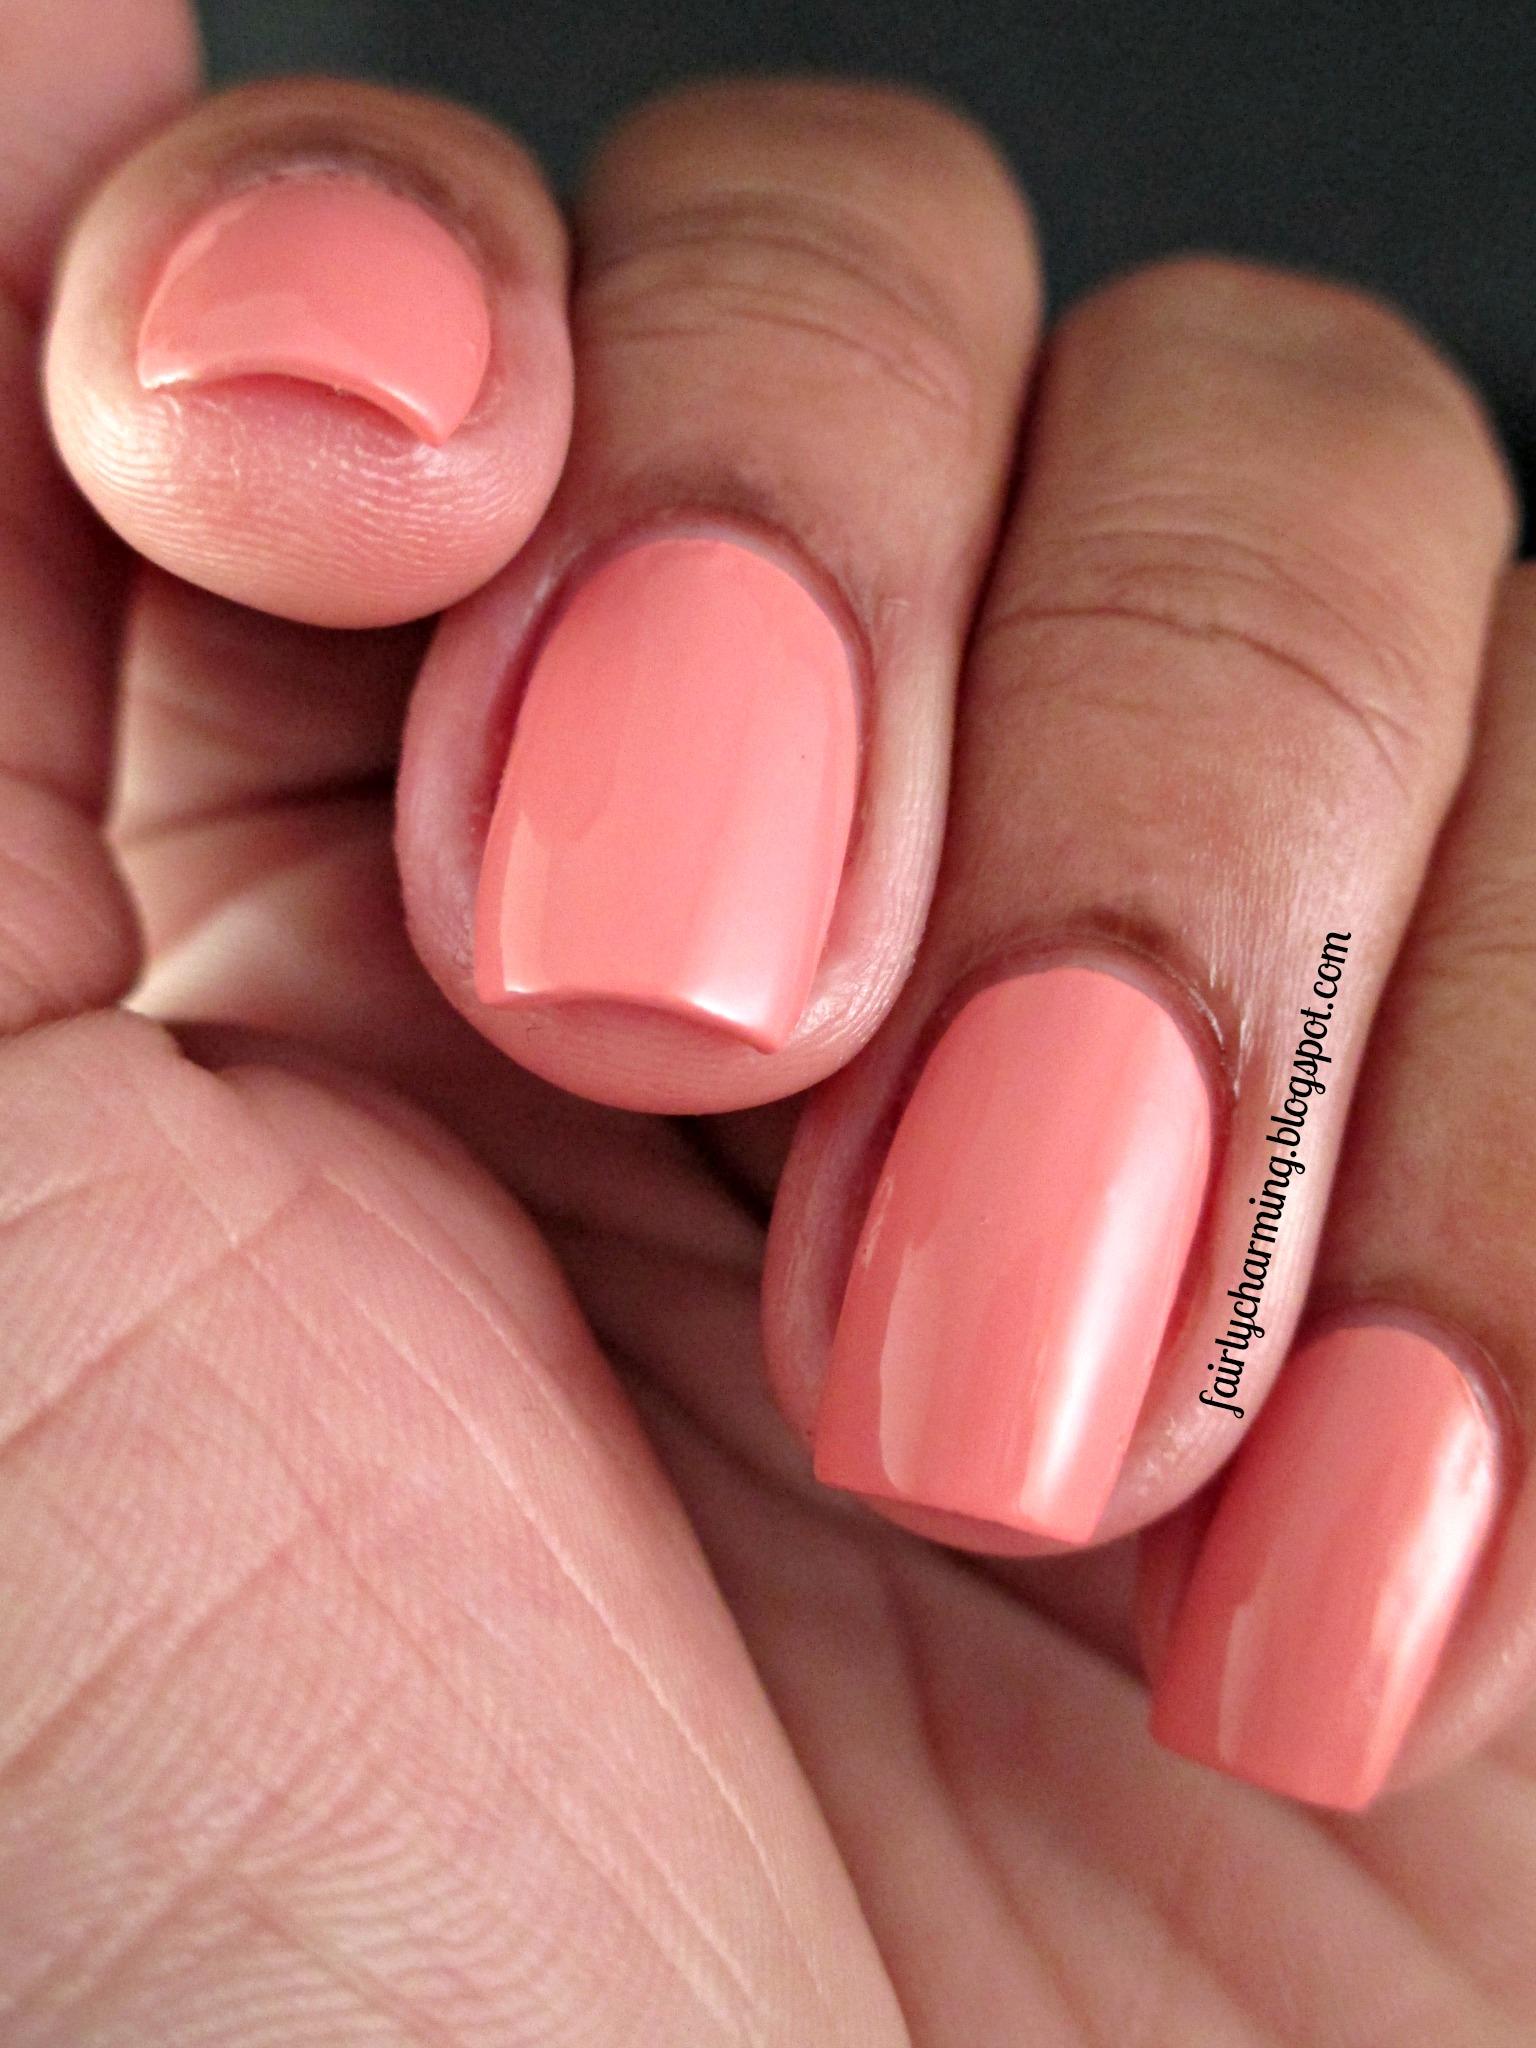 Sunset Boulevard - Peach Coral Pink Creme Nail Polish · Spellbound ...